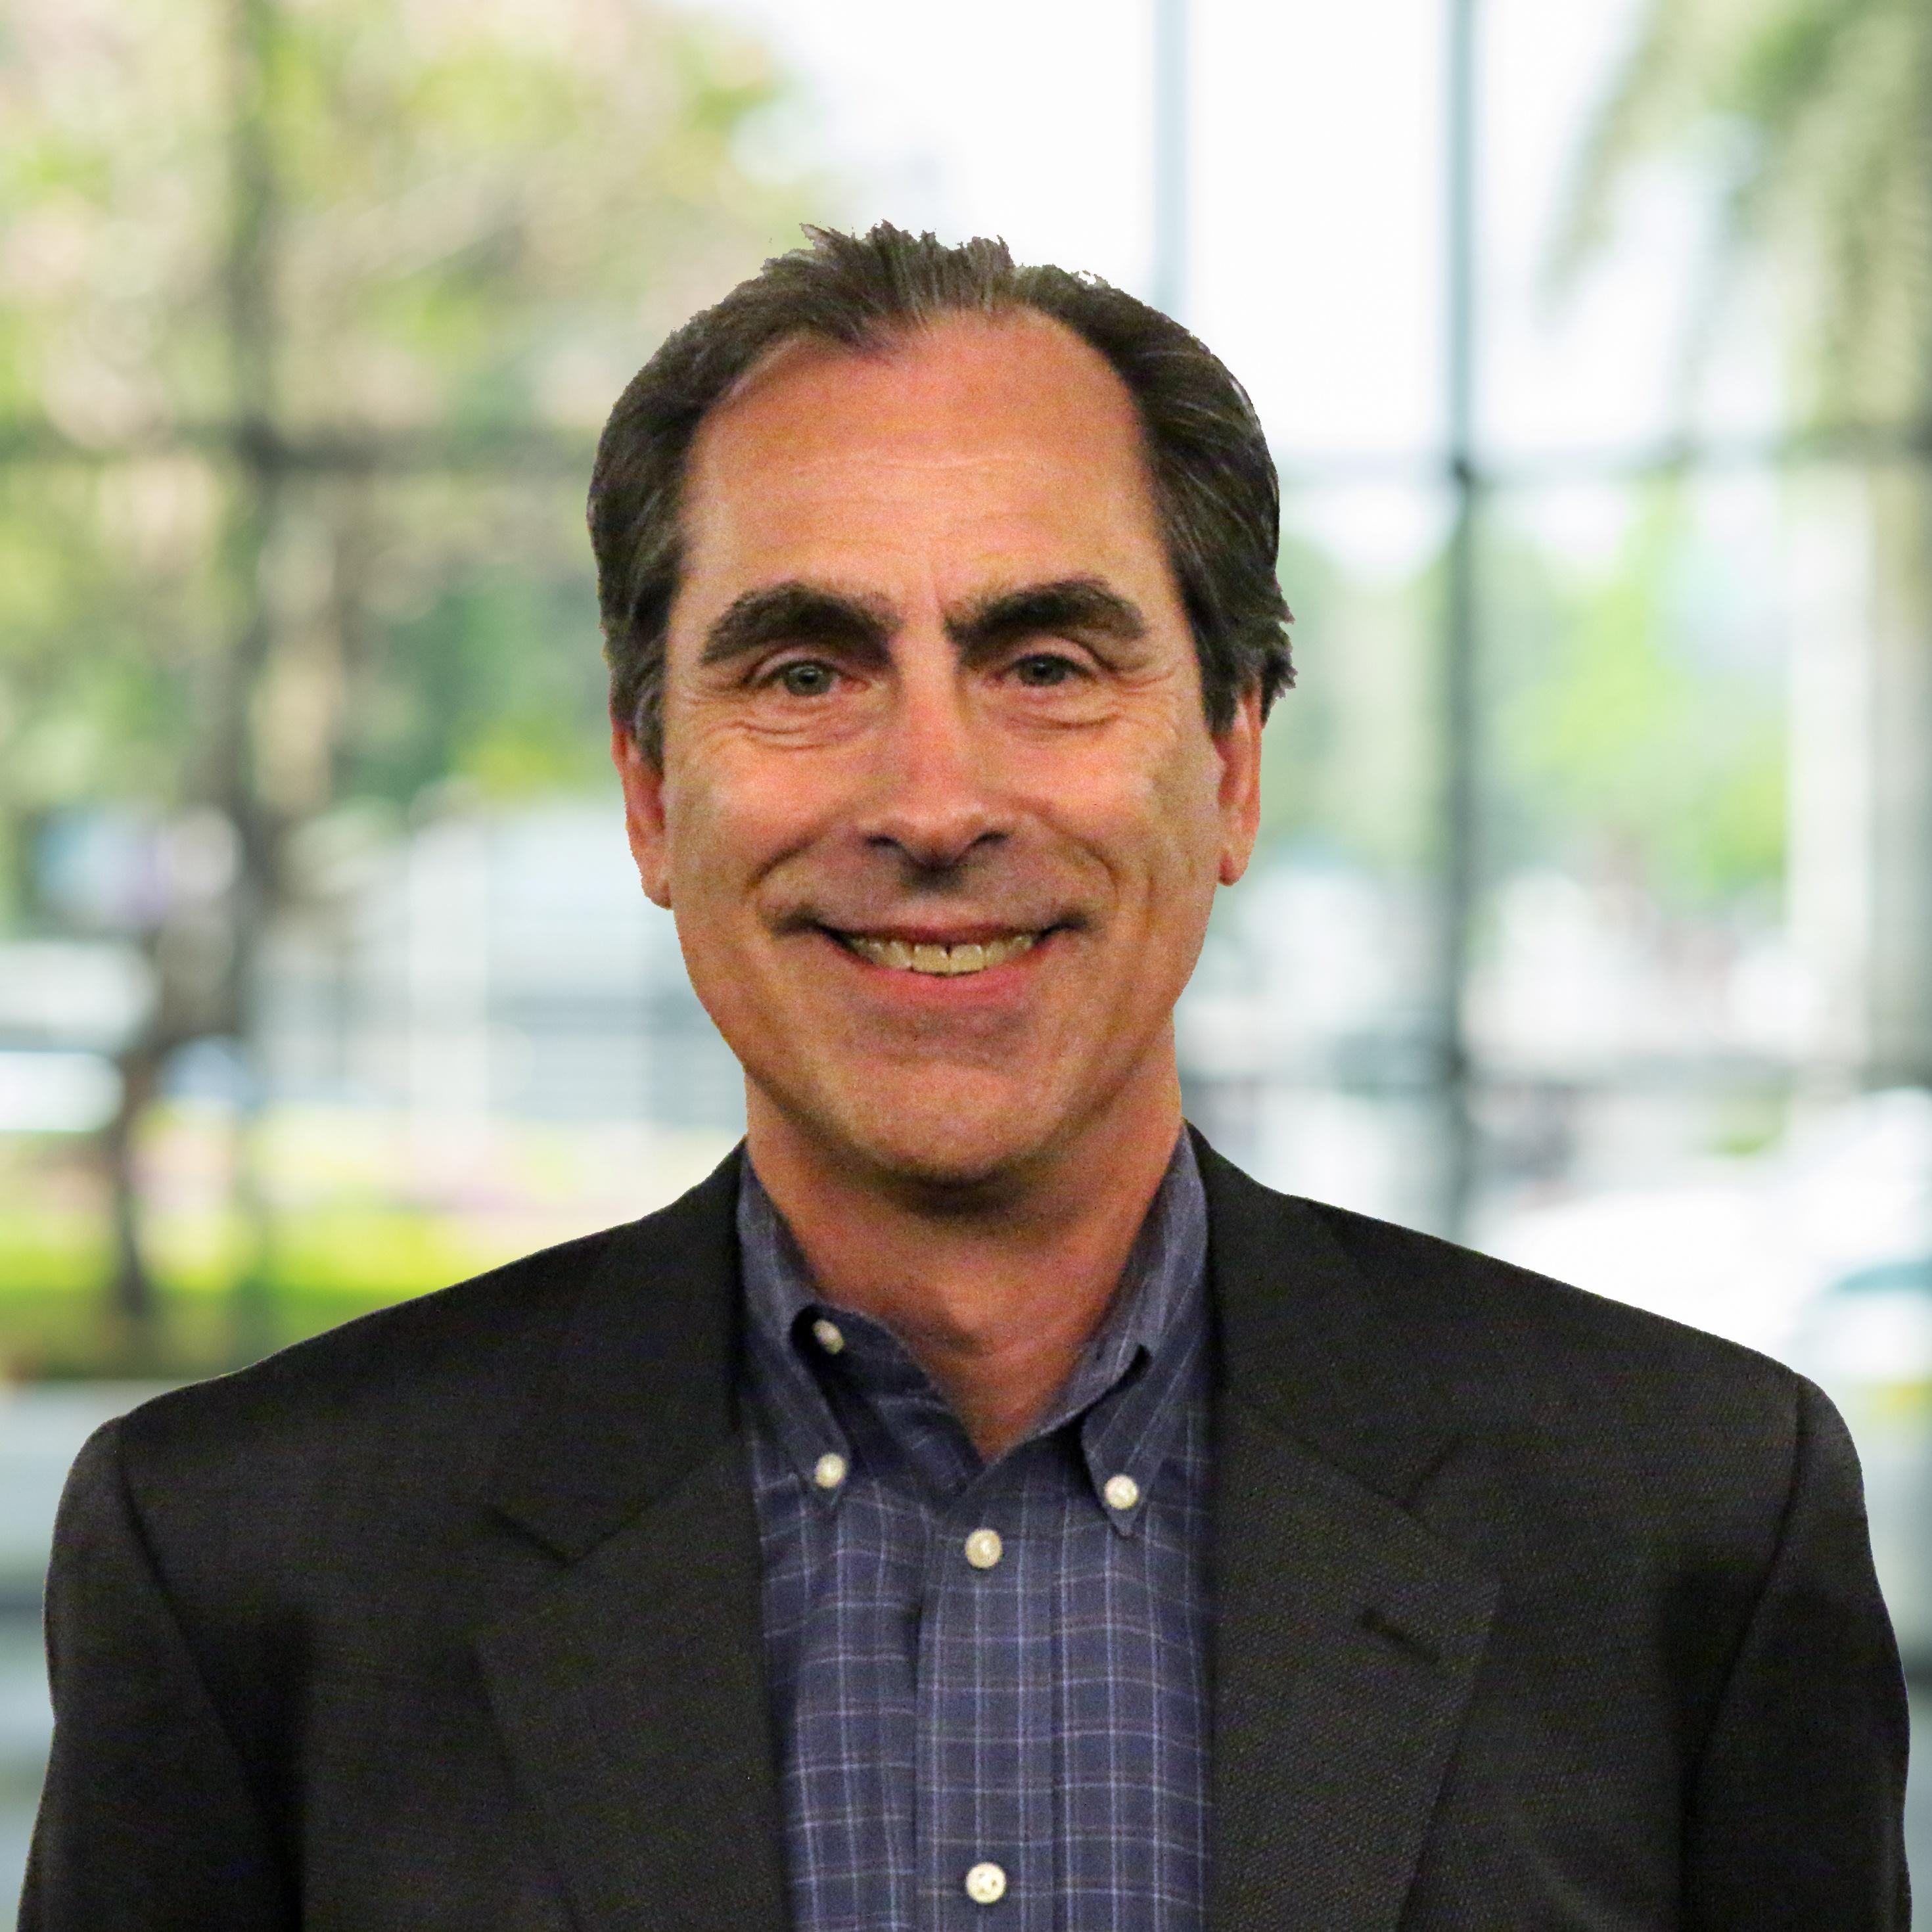 Martin Begley - Director of Adaptive Insights Practice